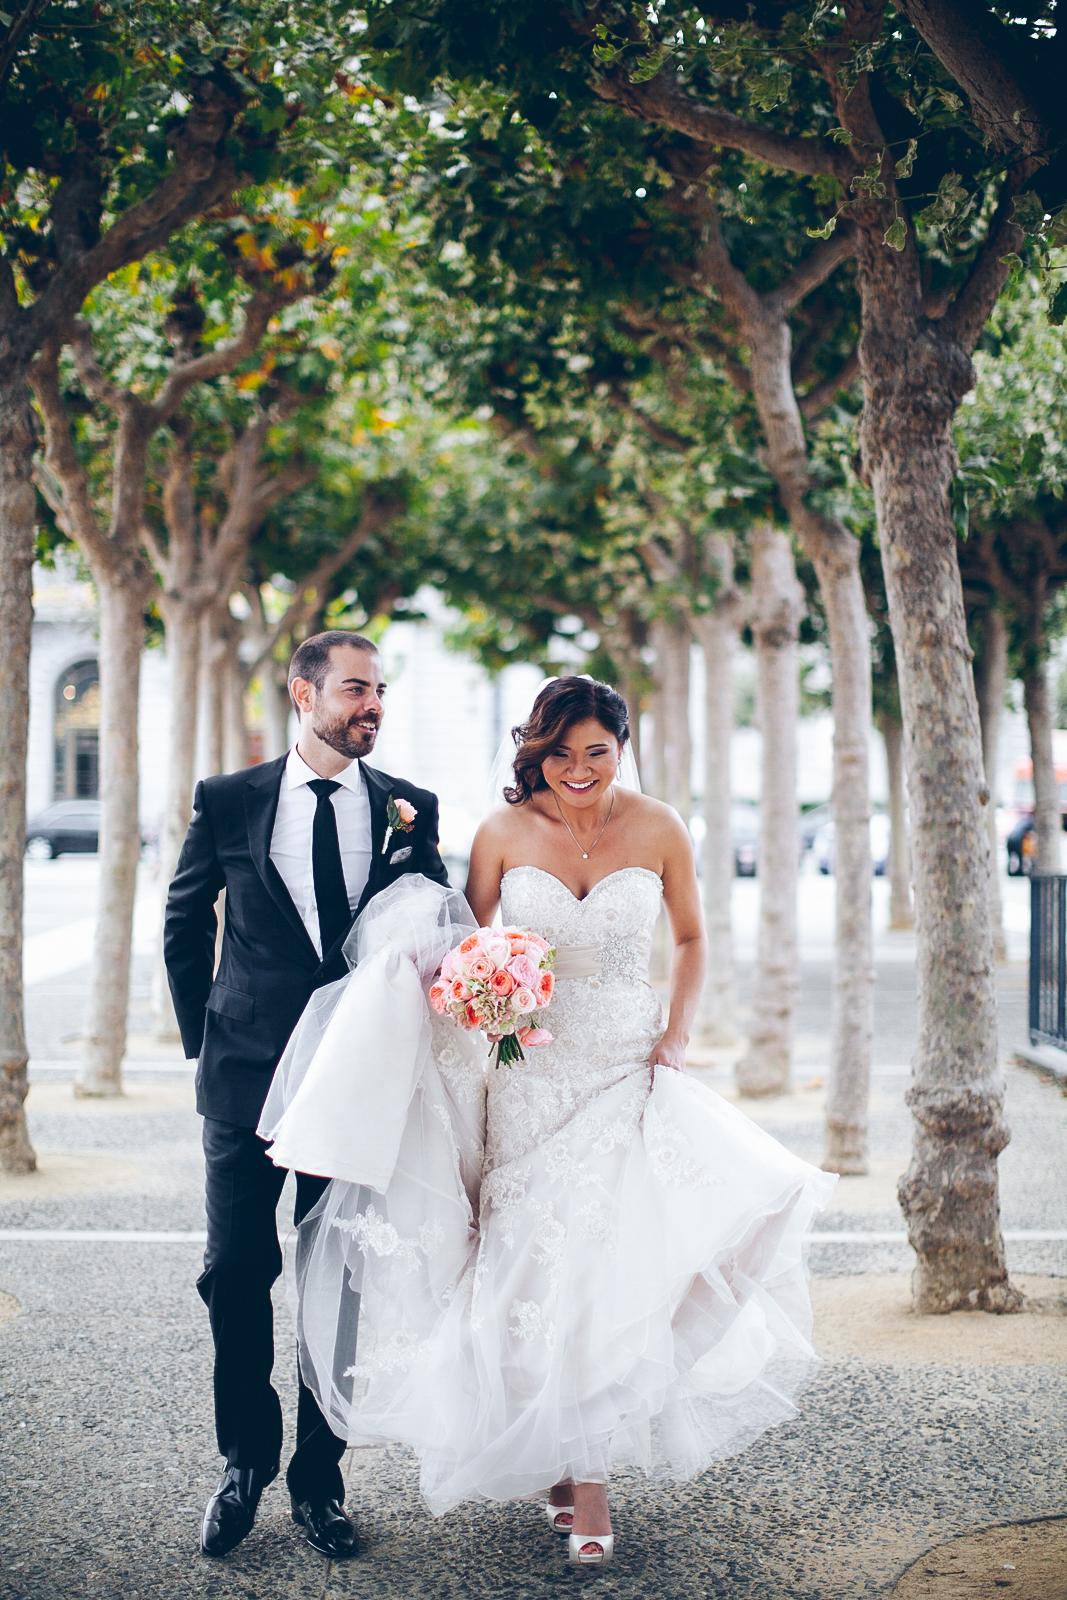 San_francisco_city_hall_wedding_photography_meegan_travis_ebony_siovhan_bokeh_photography_60.jpg